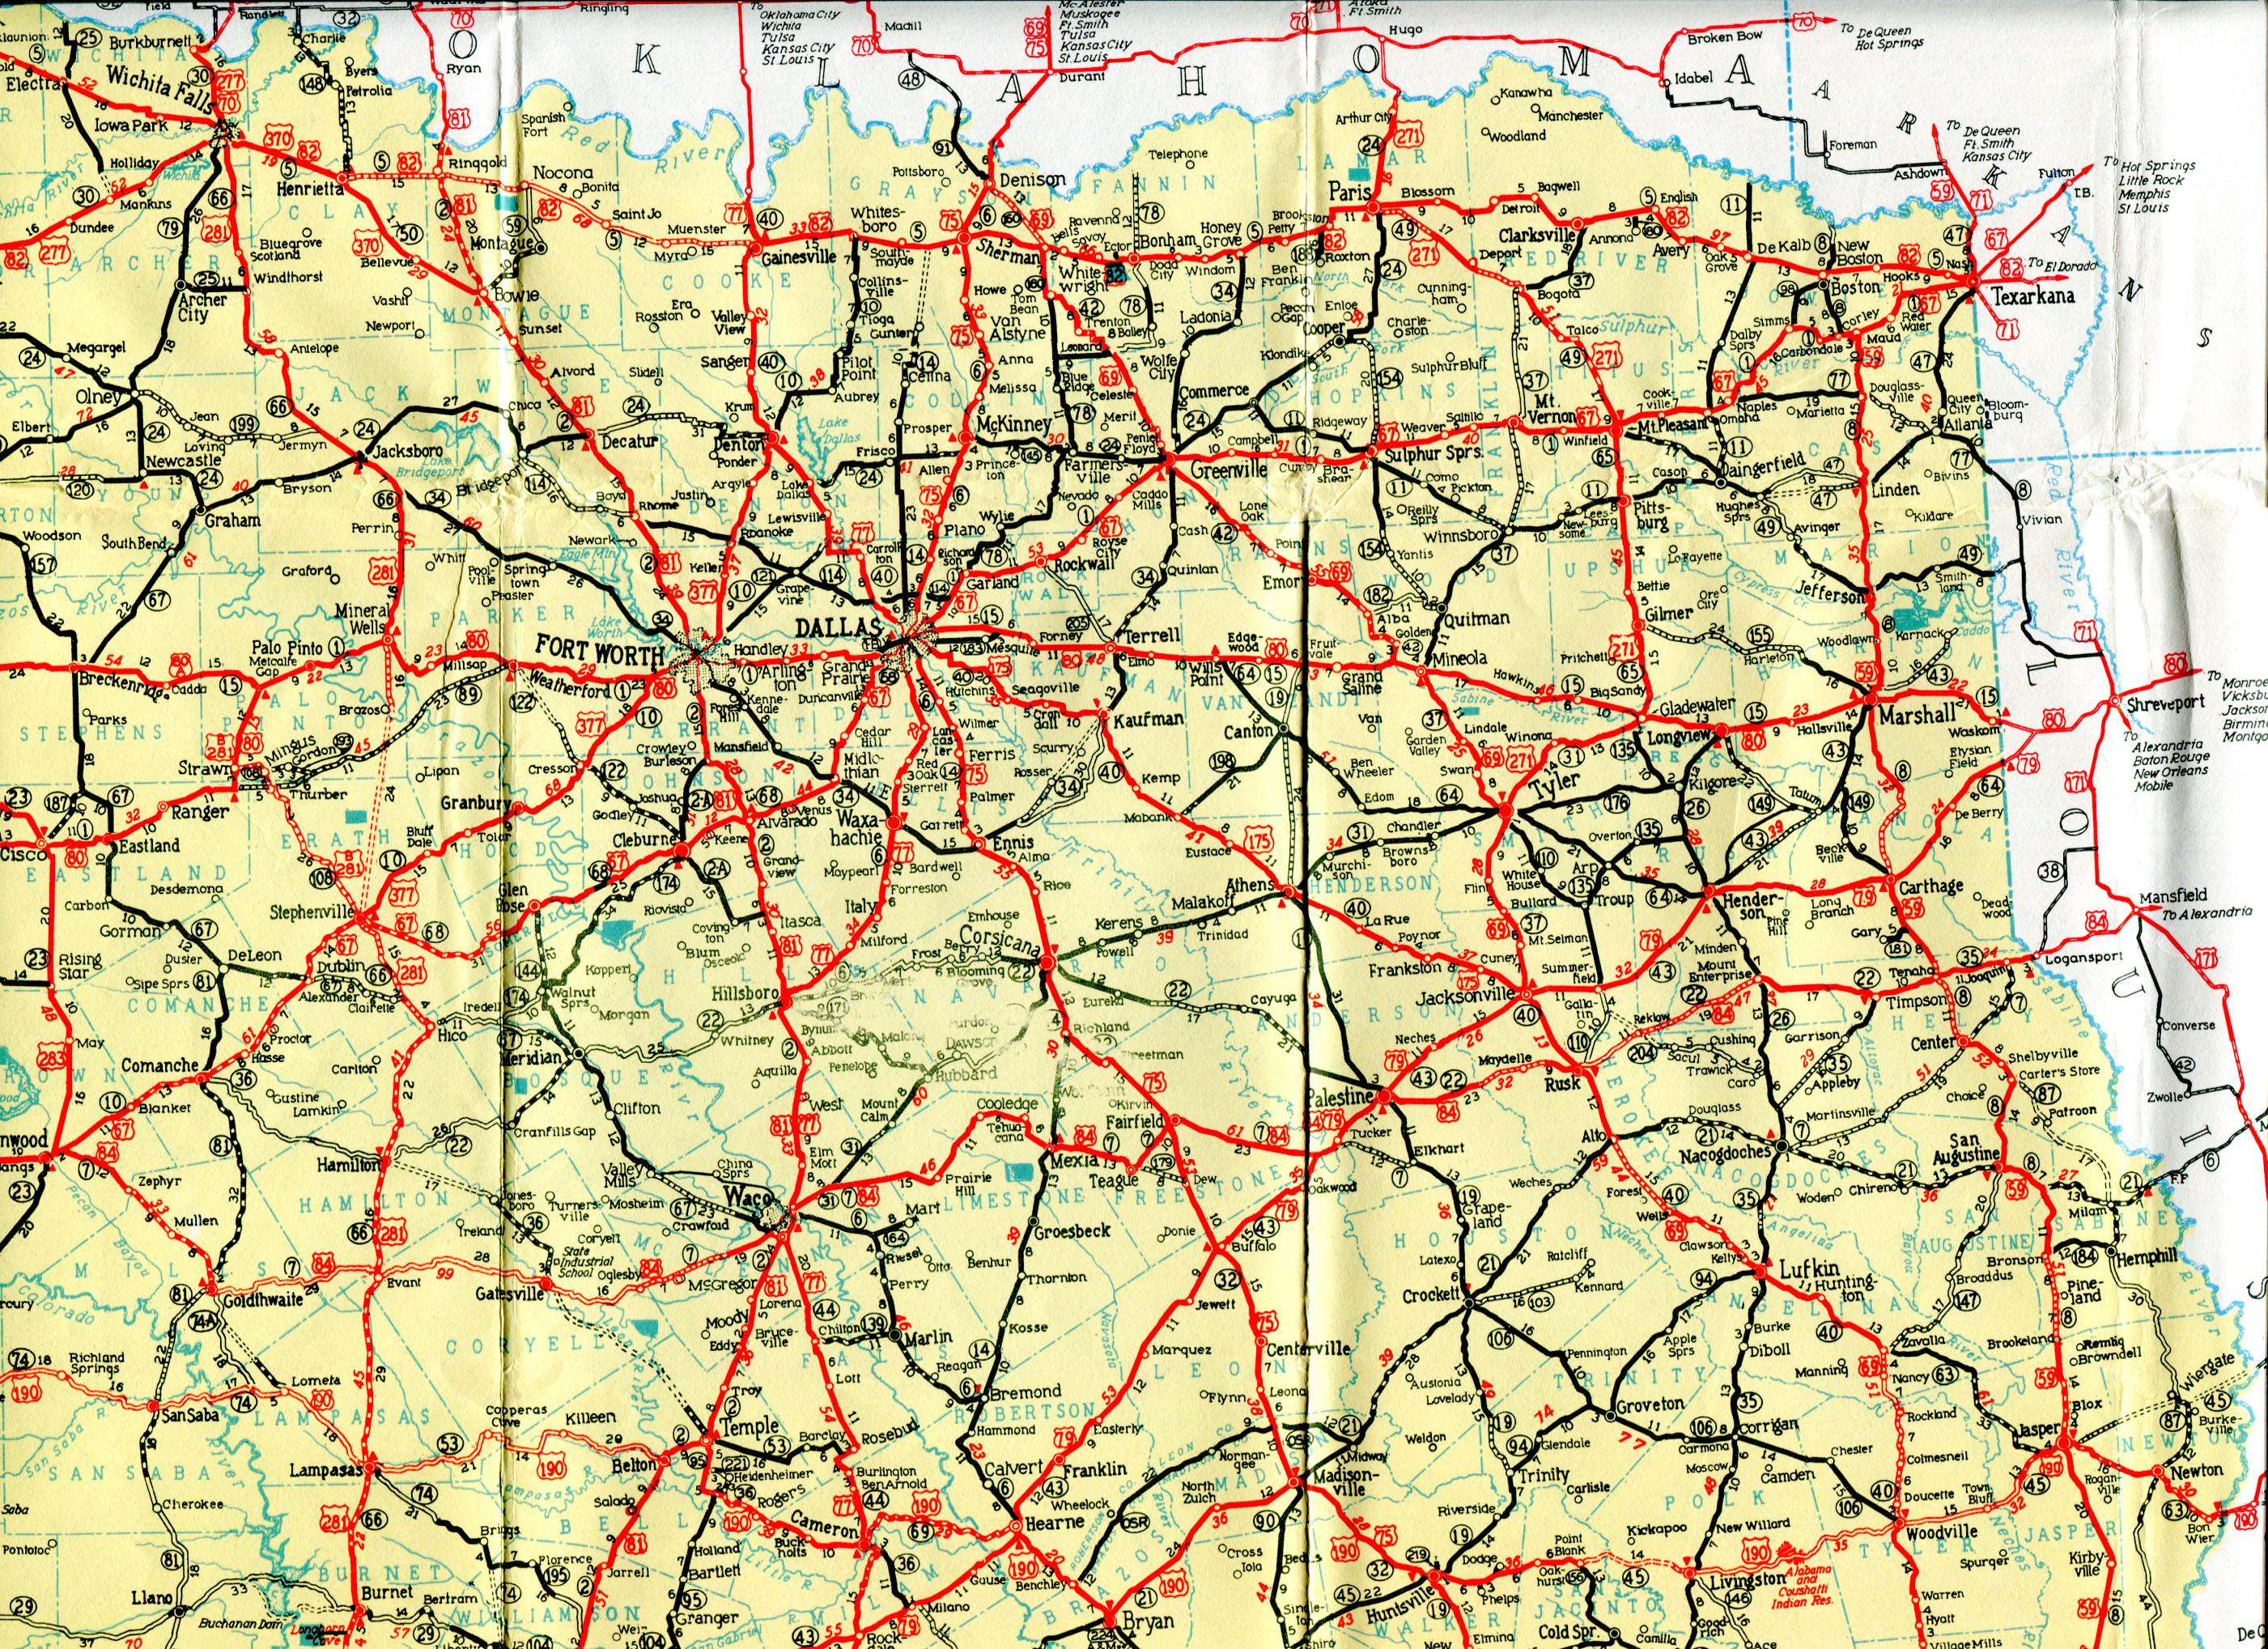 Old Highway Maps Of Texas - Mabank Texas Map